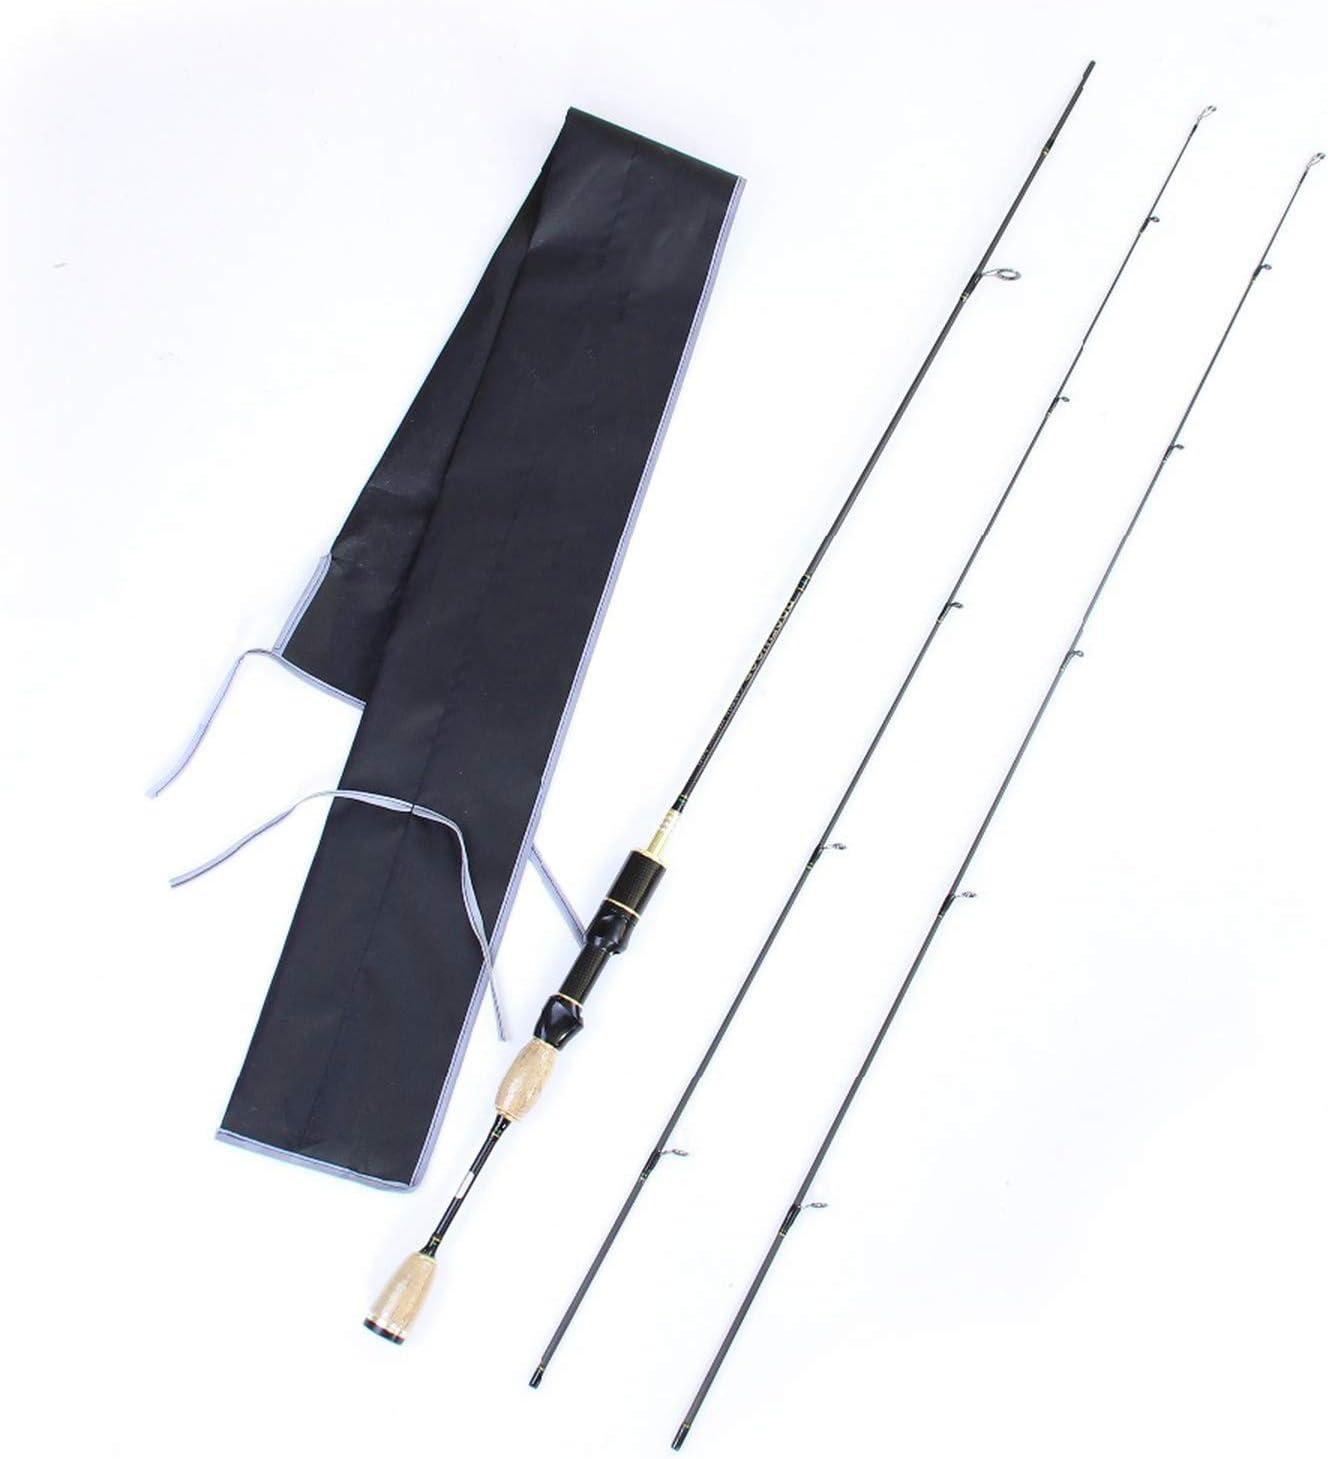 Amazing21 ul - Caña de Pescar (1,8 m, 0,8-5 g, Ultraligera), 1.8 m ...